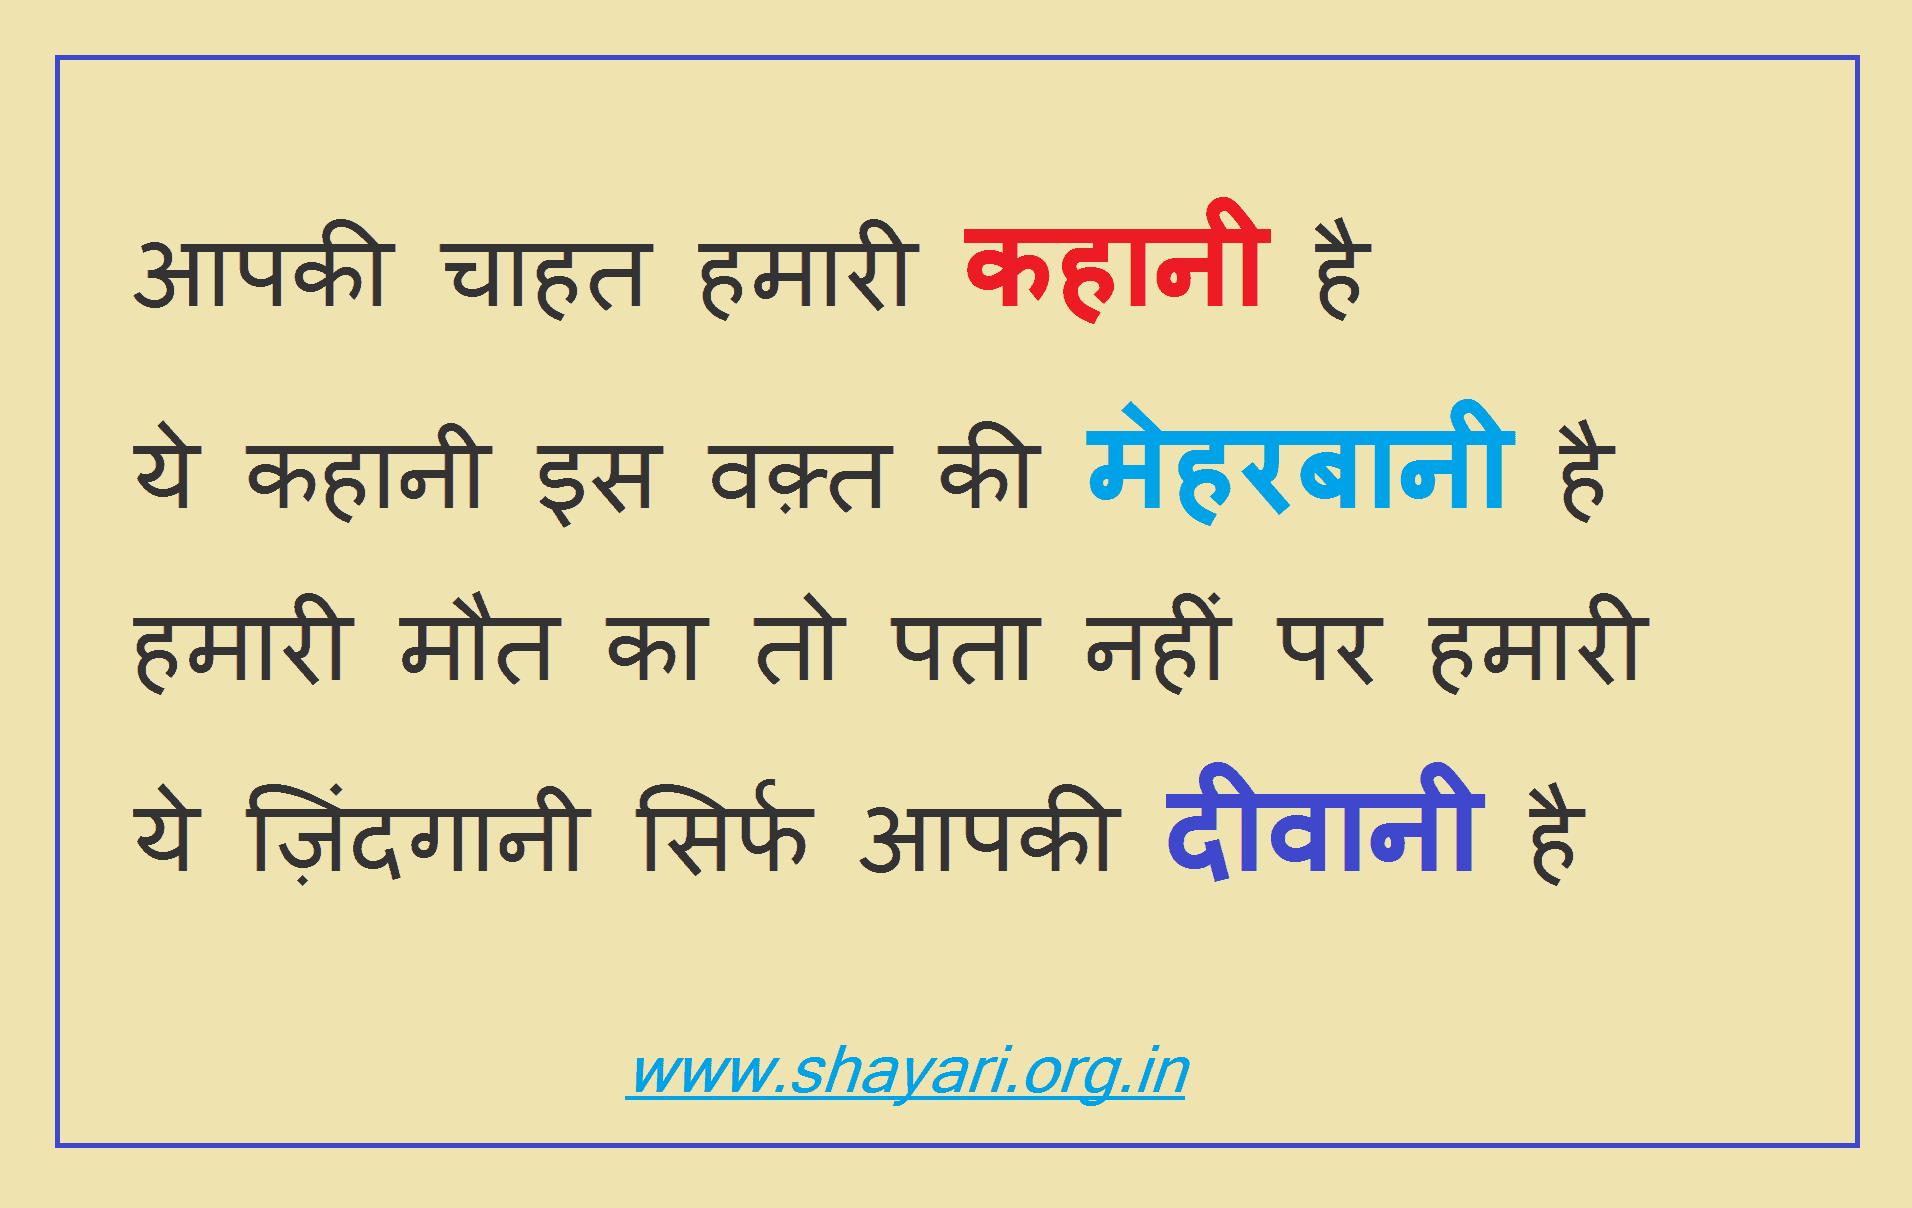 Hindi Love Shayari - Tumhari Meherbani 2020